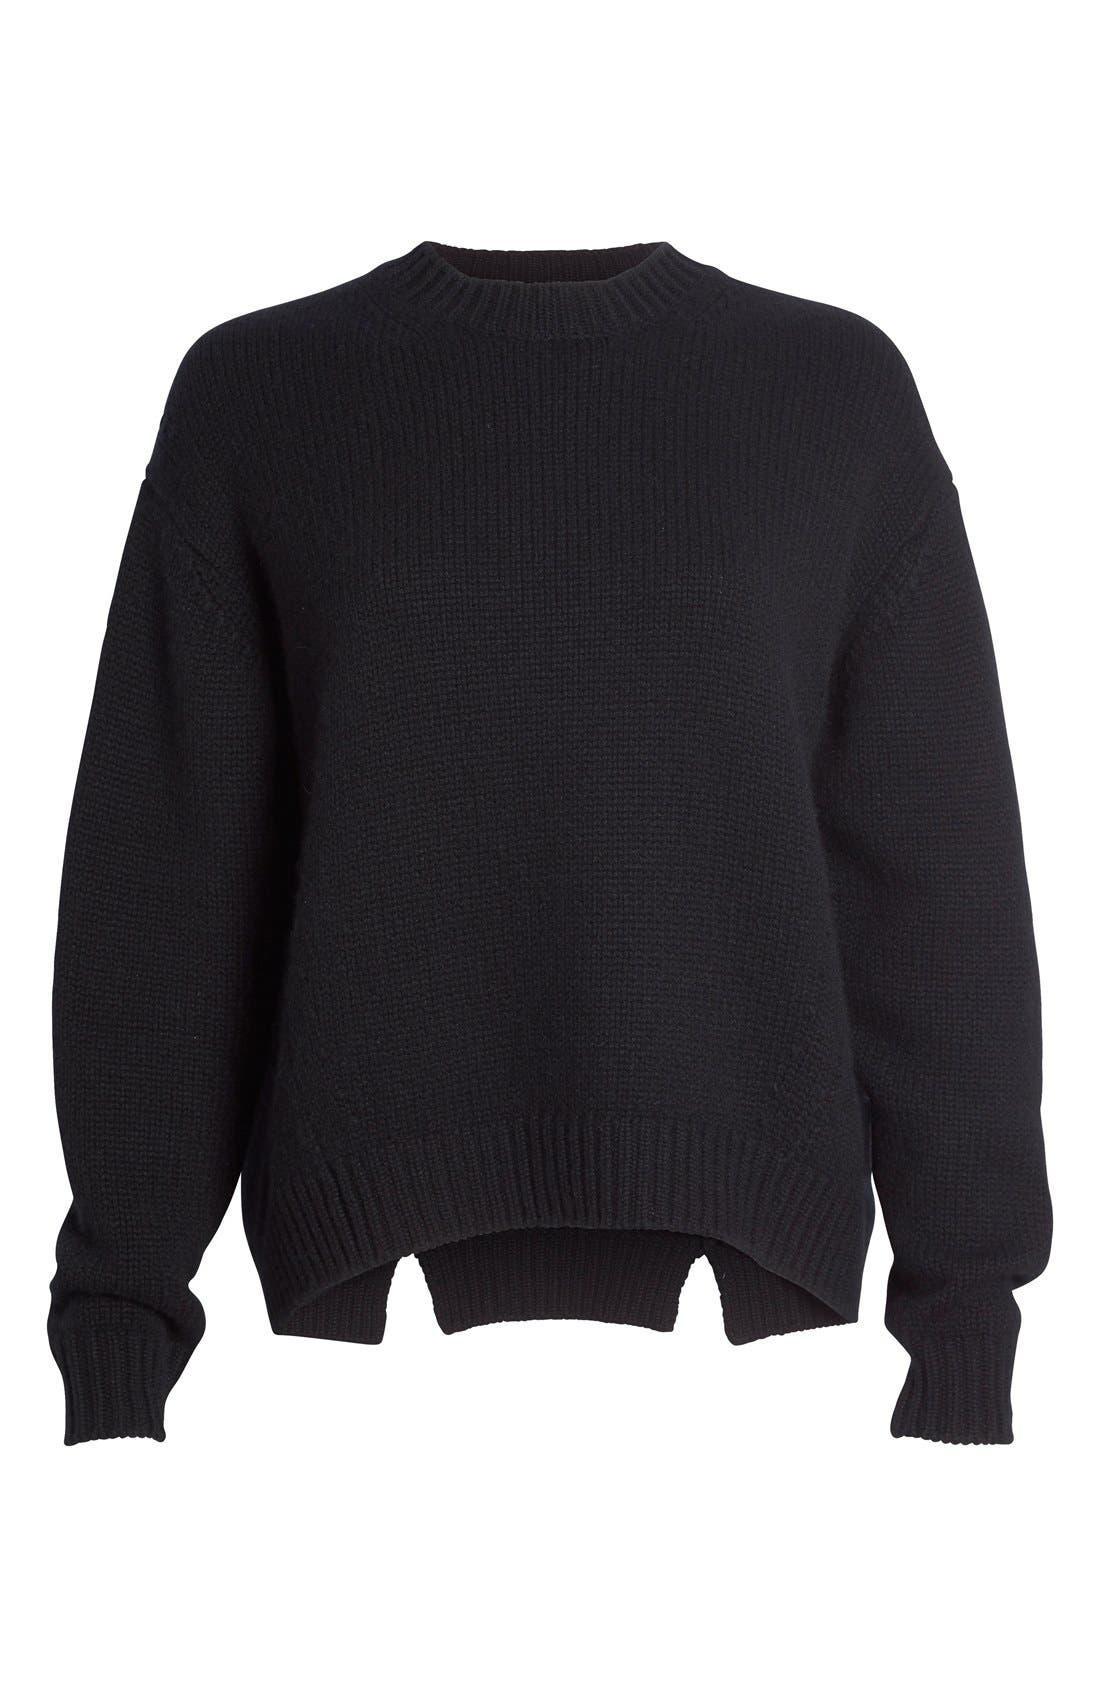 Alternate Image 4  - ACNE Studios 'Shora' Wool & Cashmere Sweater